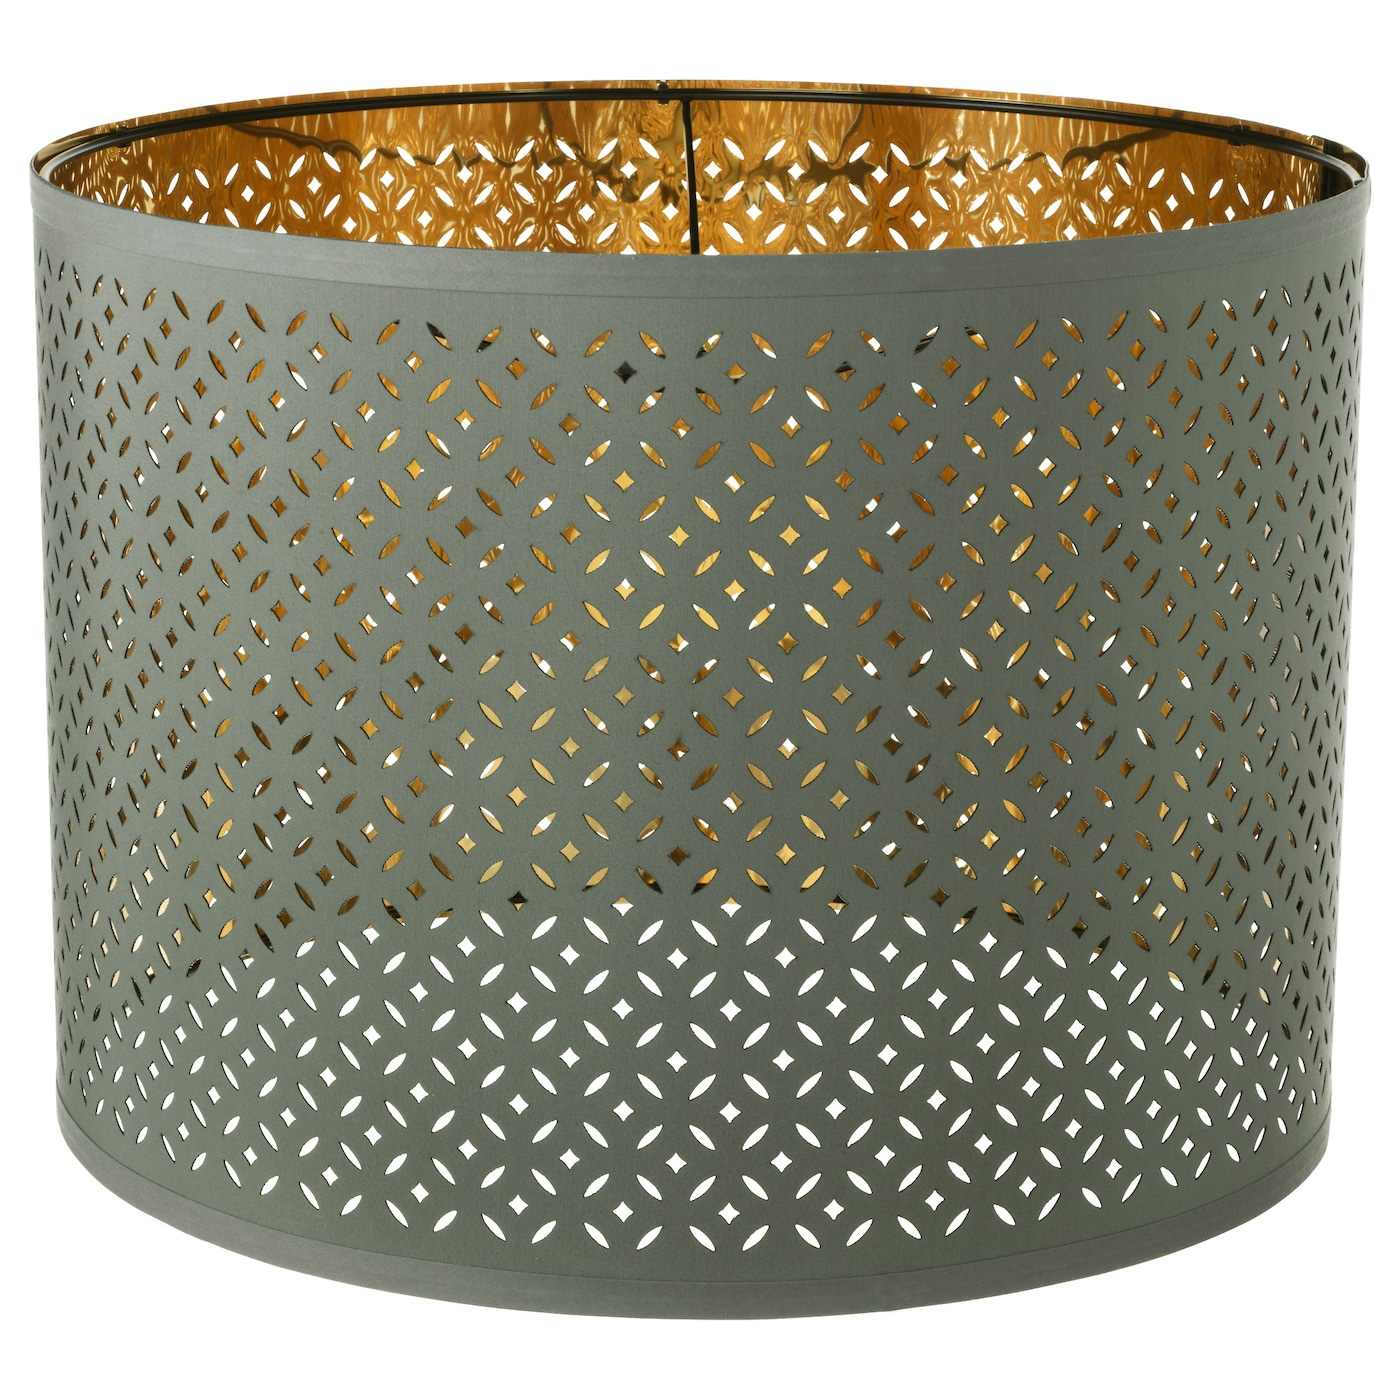 nym lamp shade green brass colour 44 cm ikea. Black Bedroom Furniture Sets. Home Design Ideas